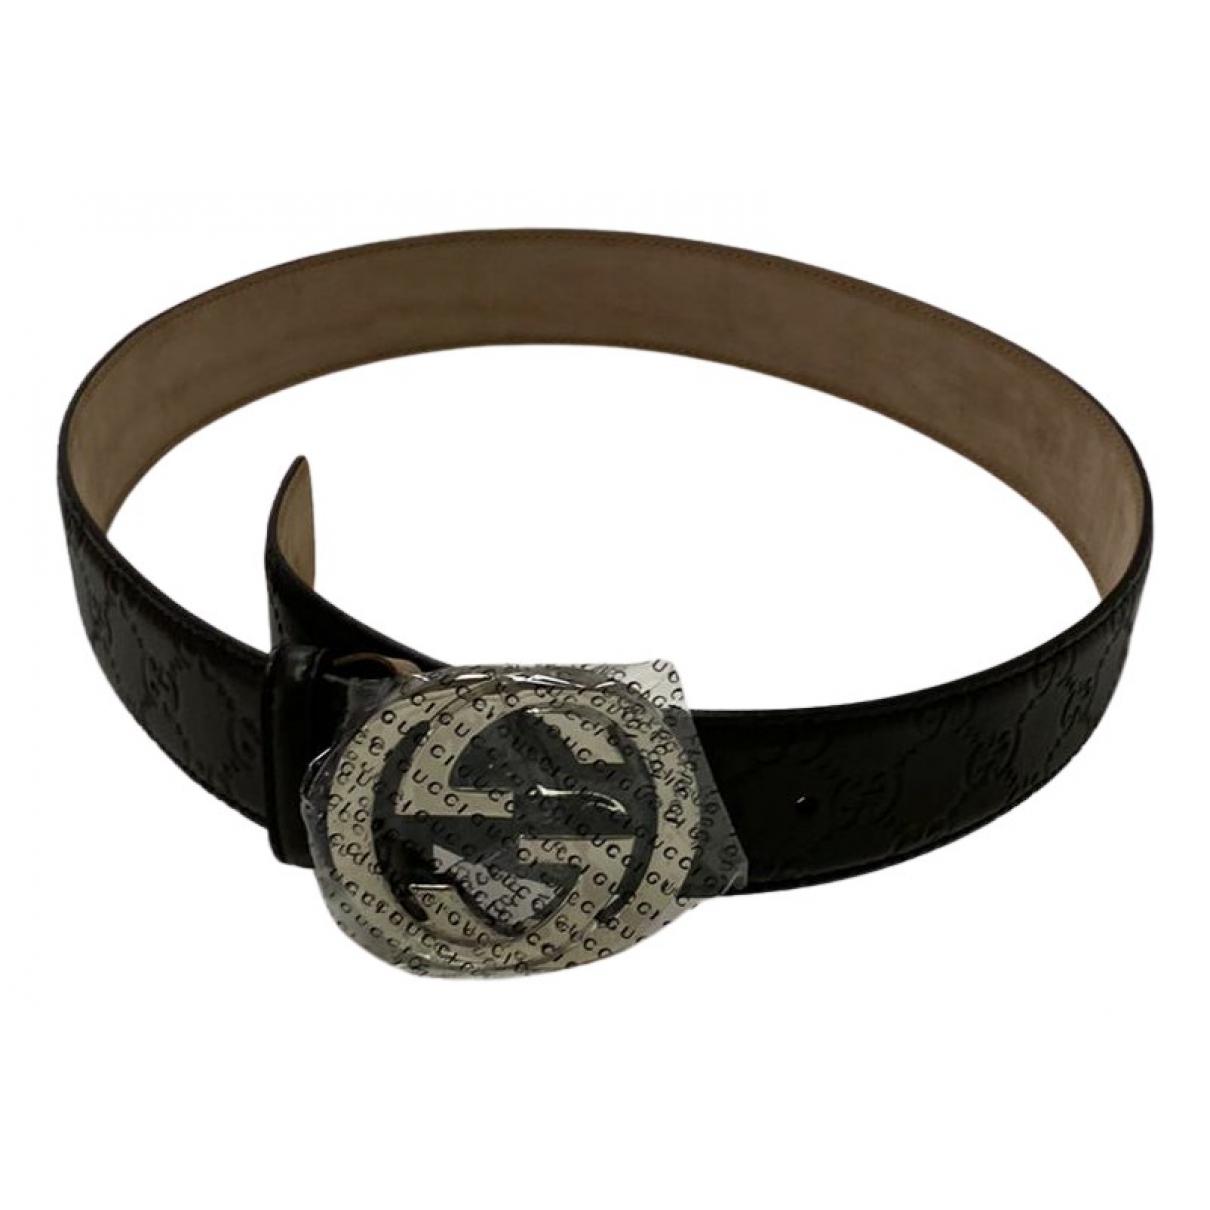 Gucci Interlocking Buckle Black Leather belt for Women M International